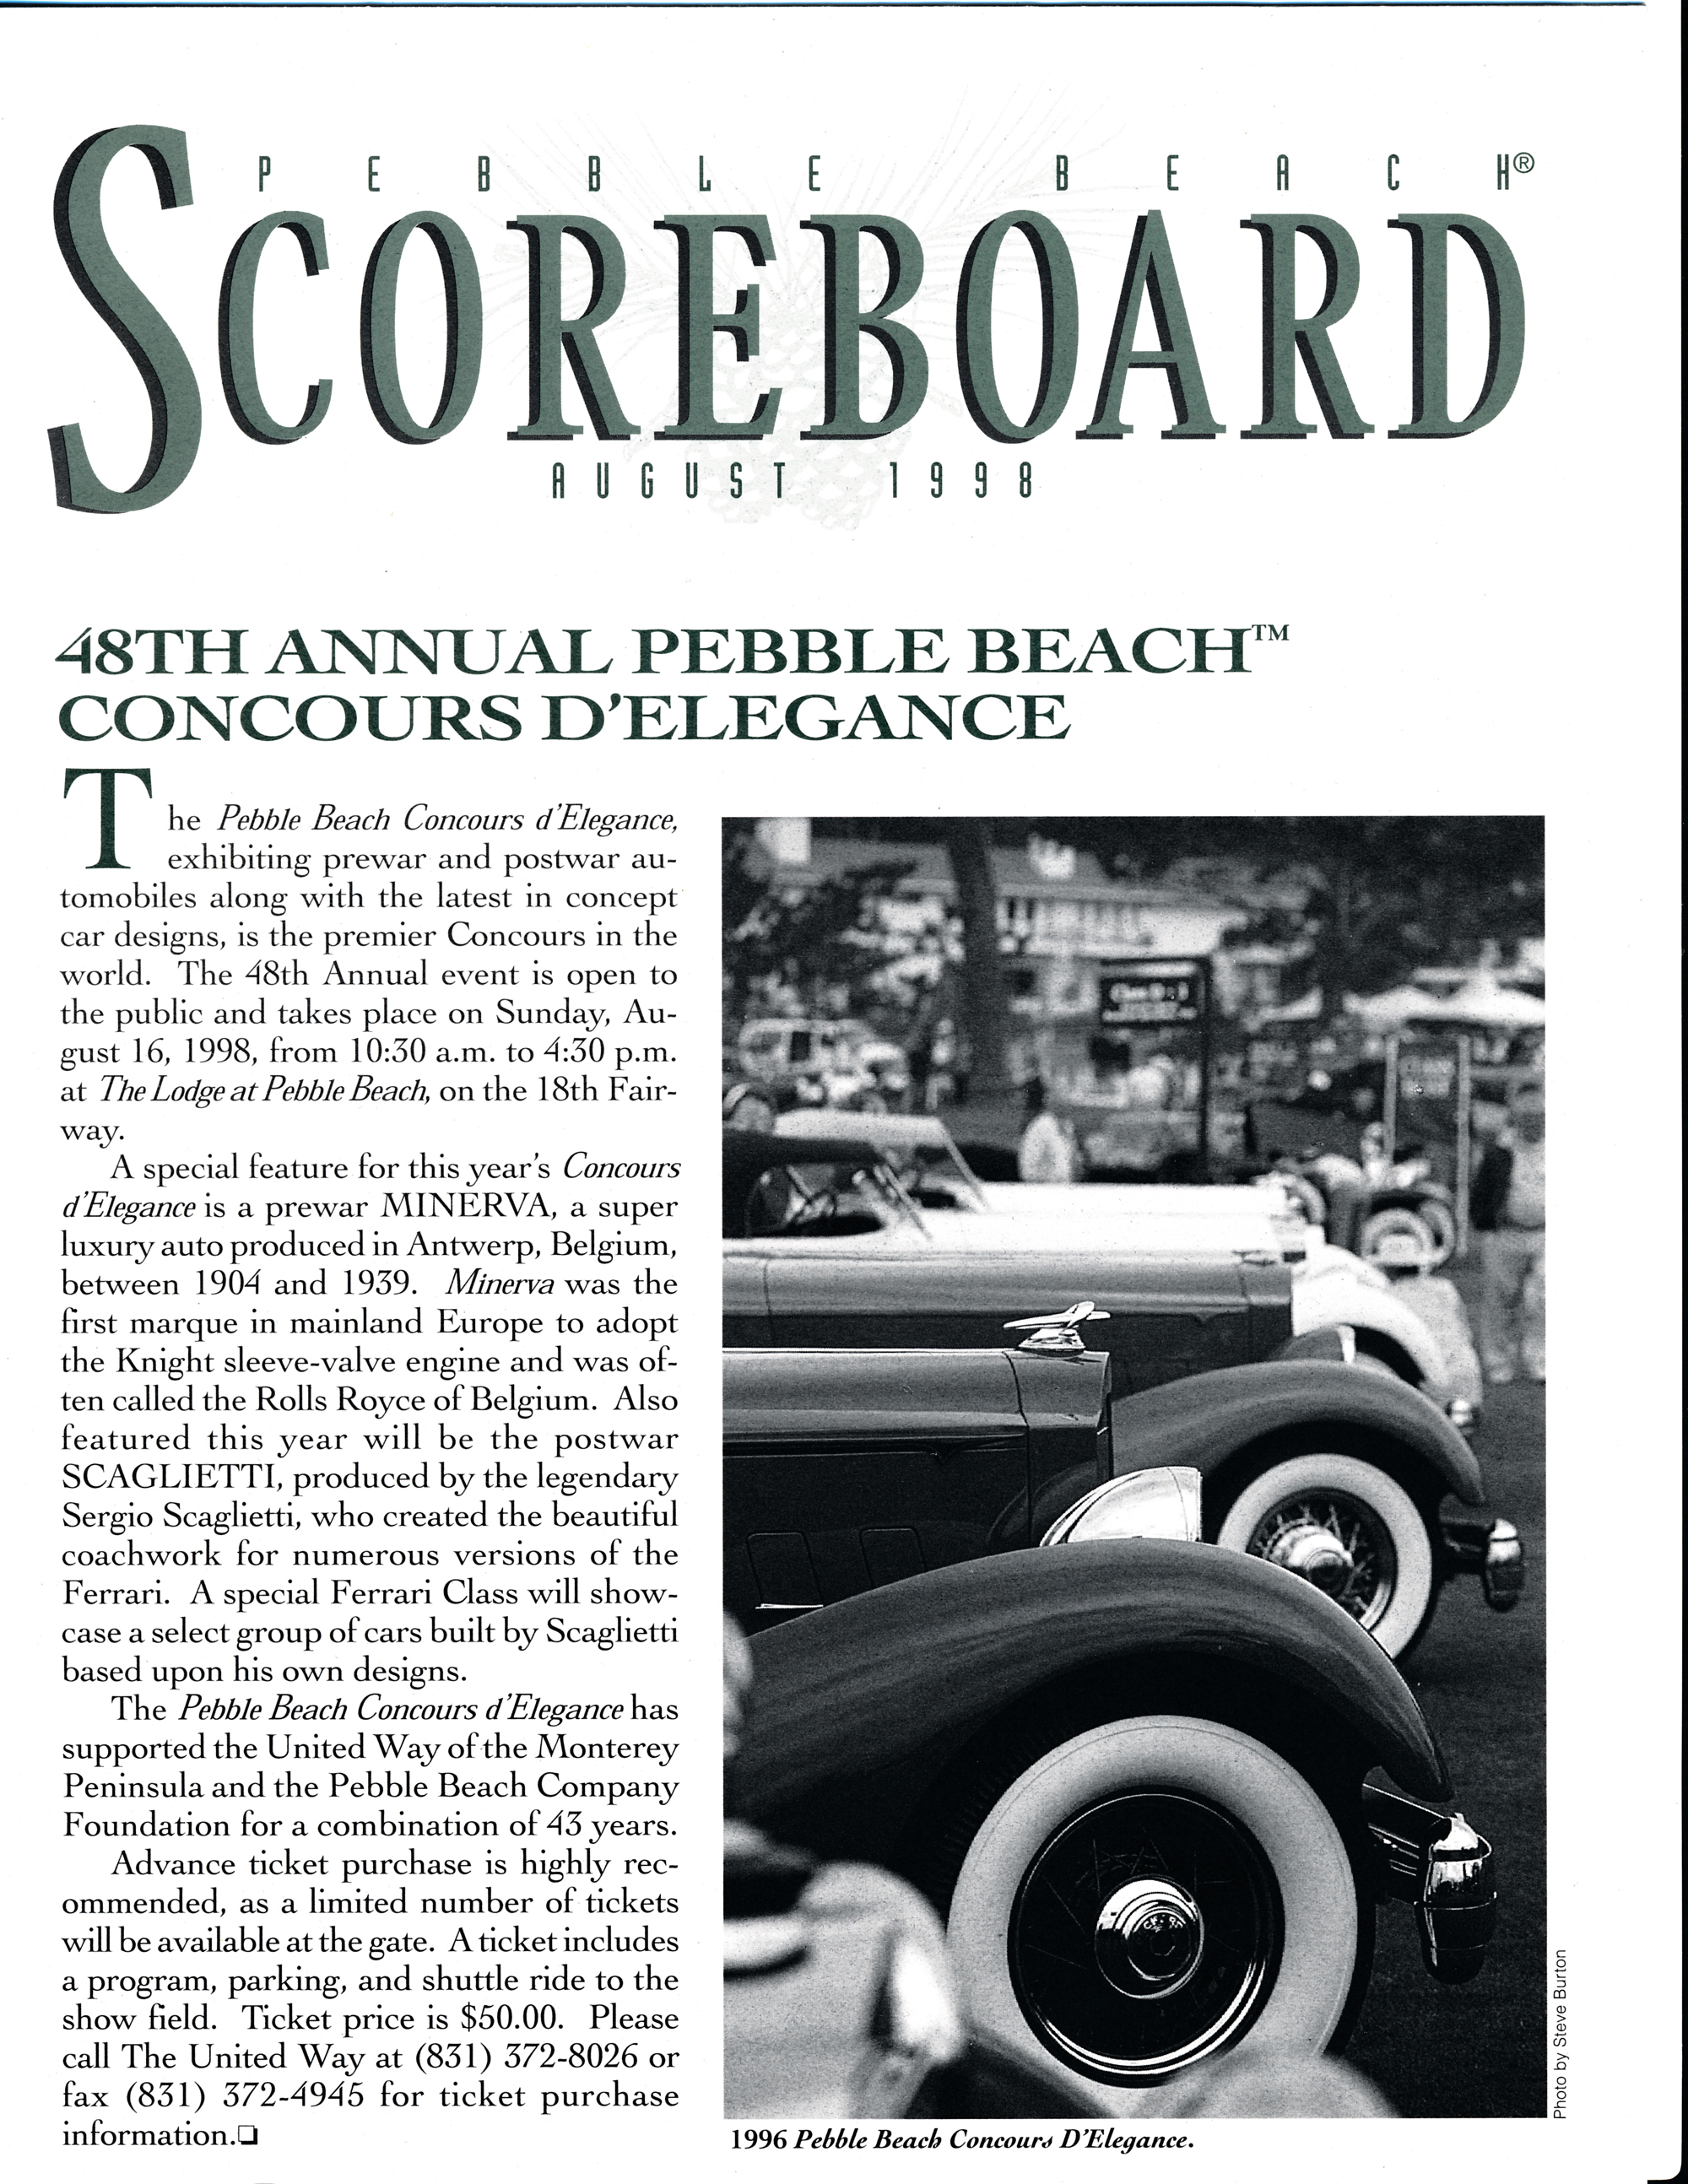 Pebble Beach Concours